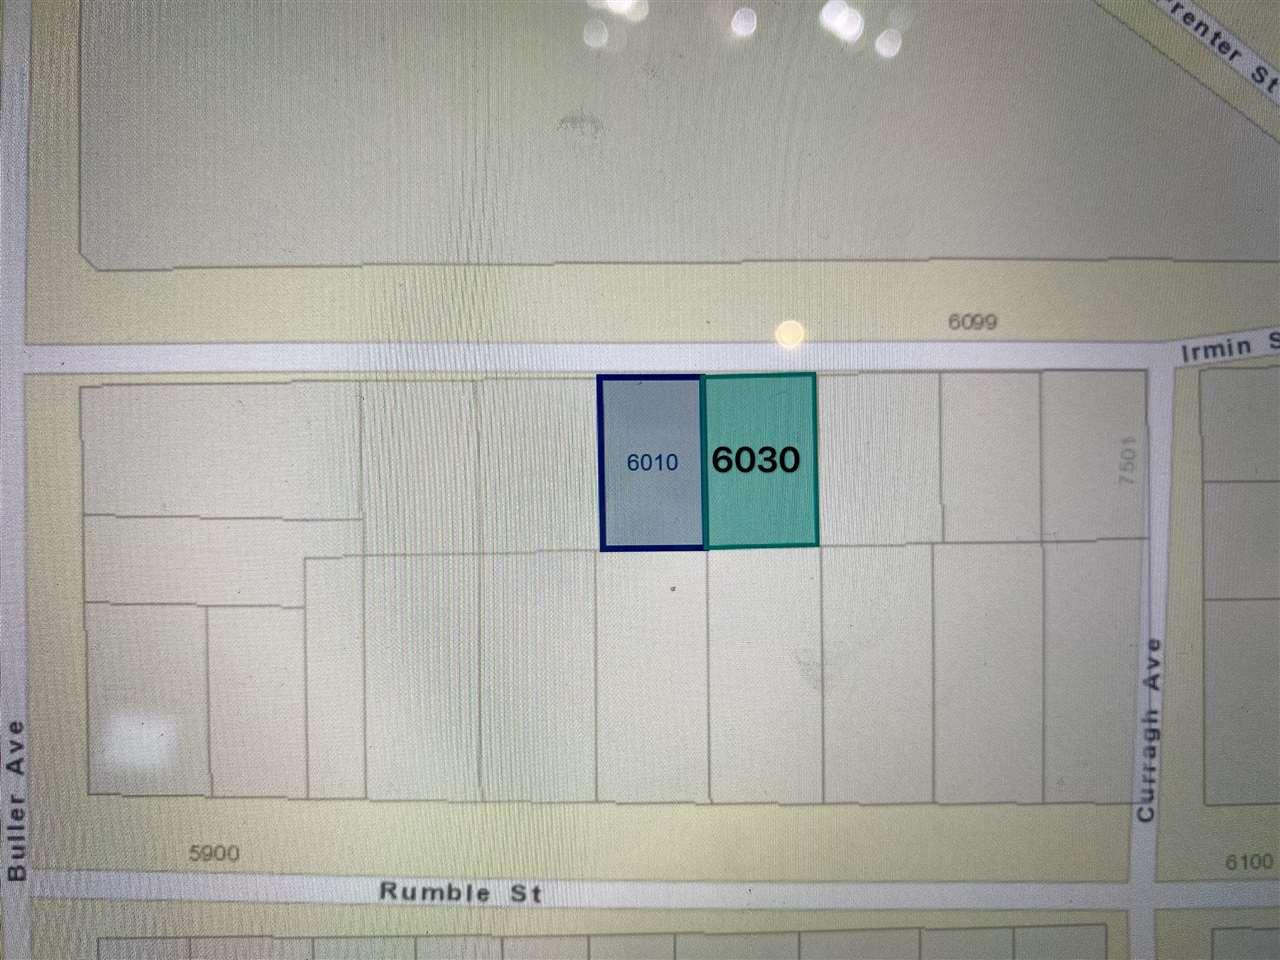 6010 IRMIN STREET, Burnaby